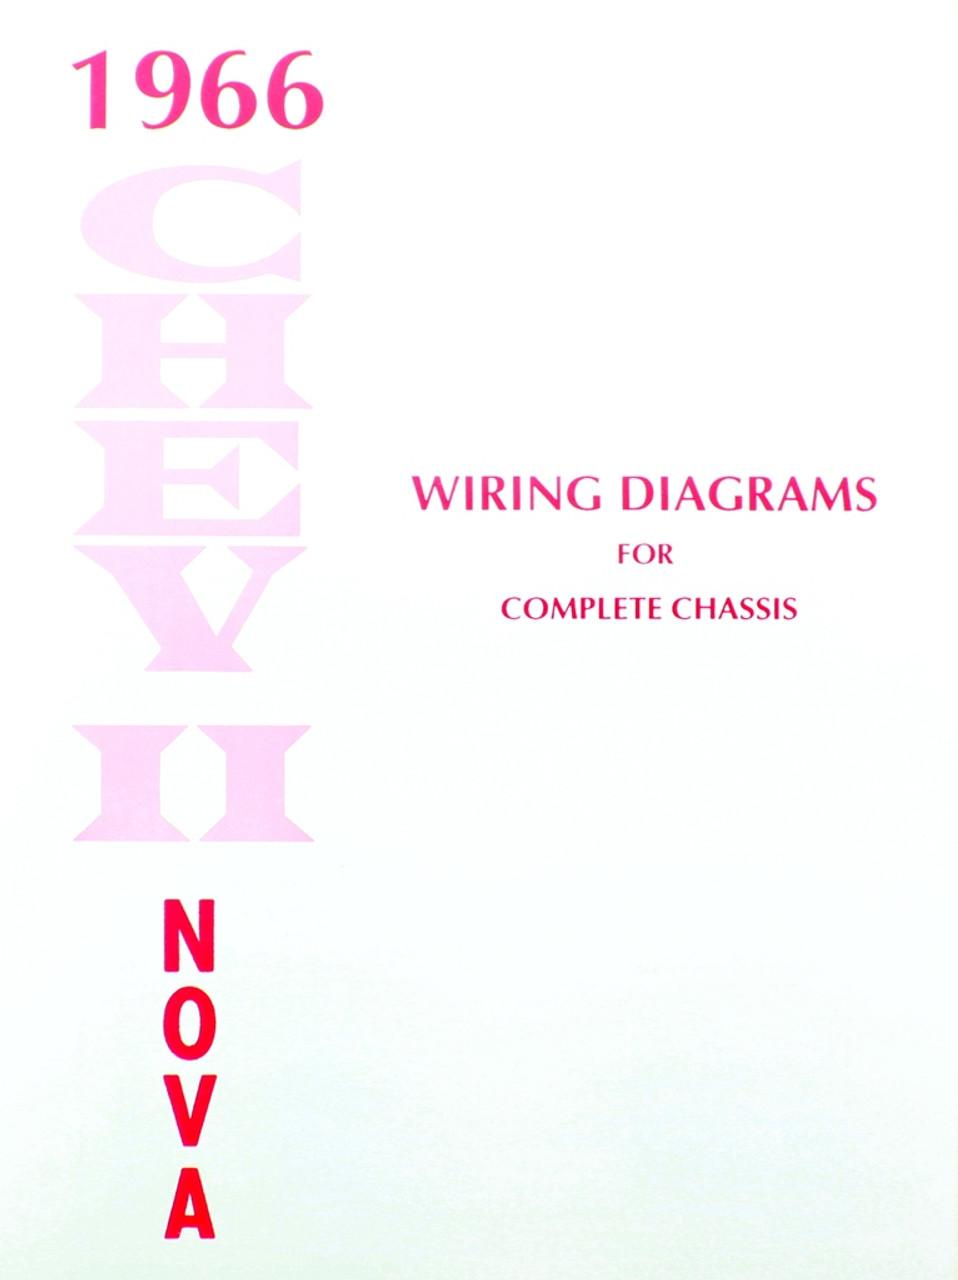 66 CHEVY NOVA ELECTRICAL WIRING DIAGRAM MANUAL 1966 - I-5 Classic ...